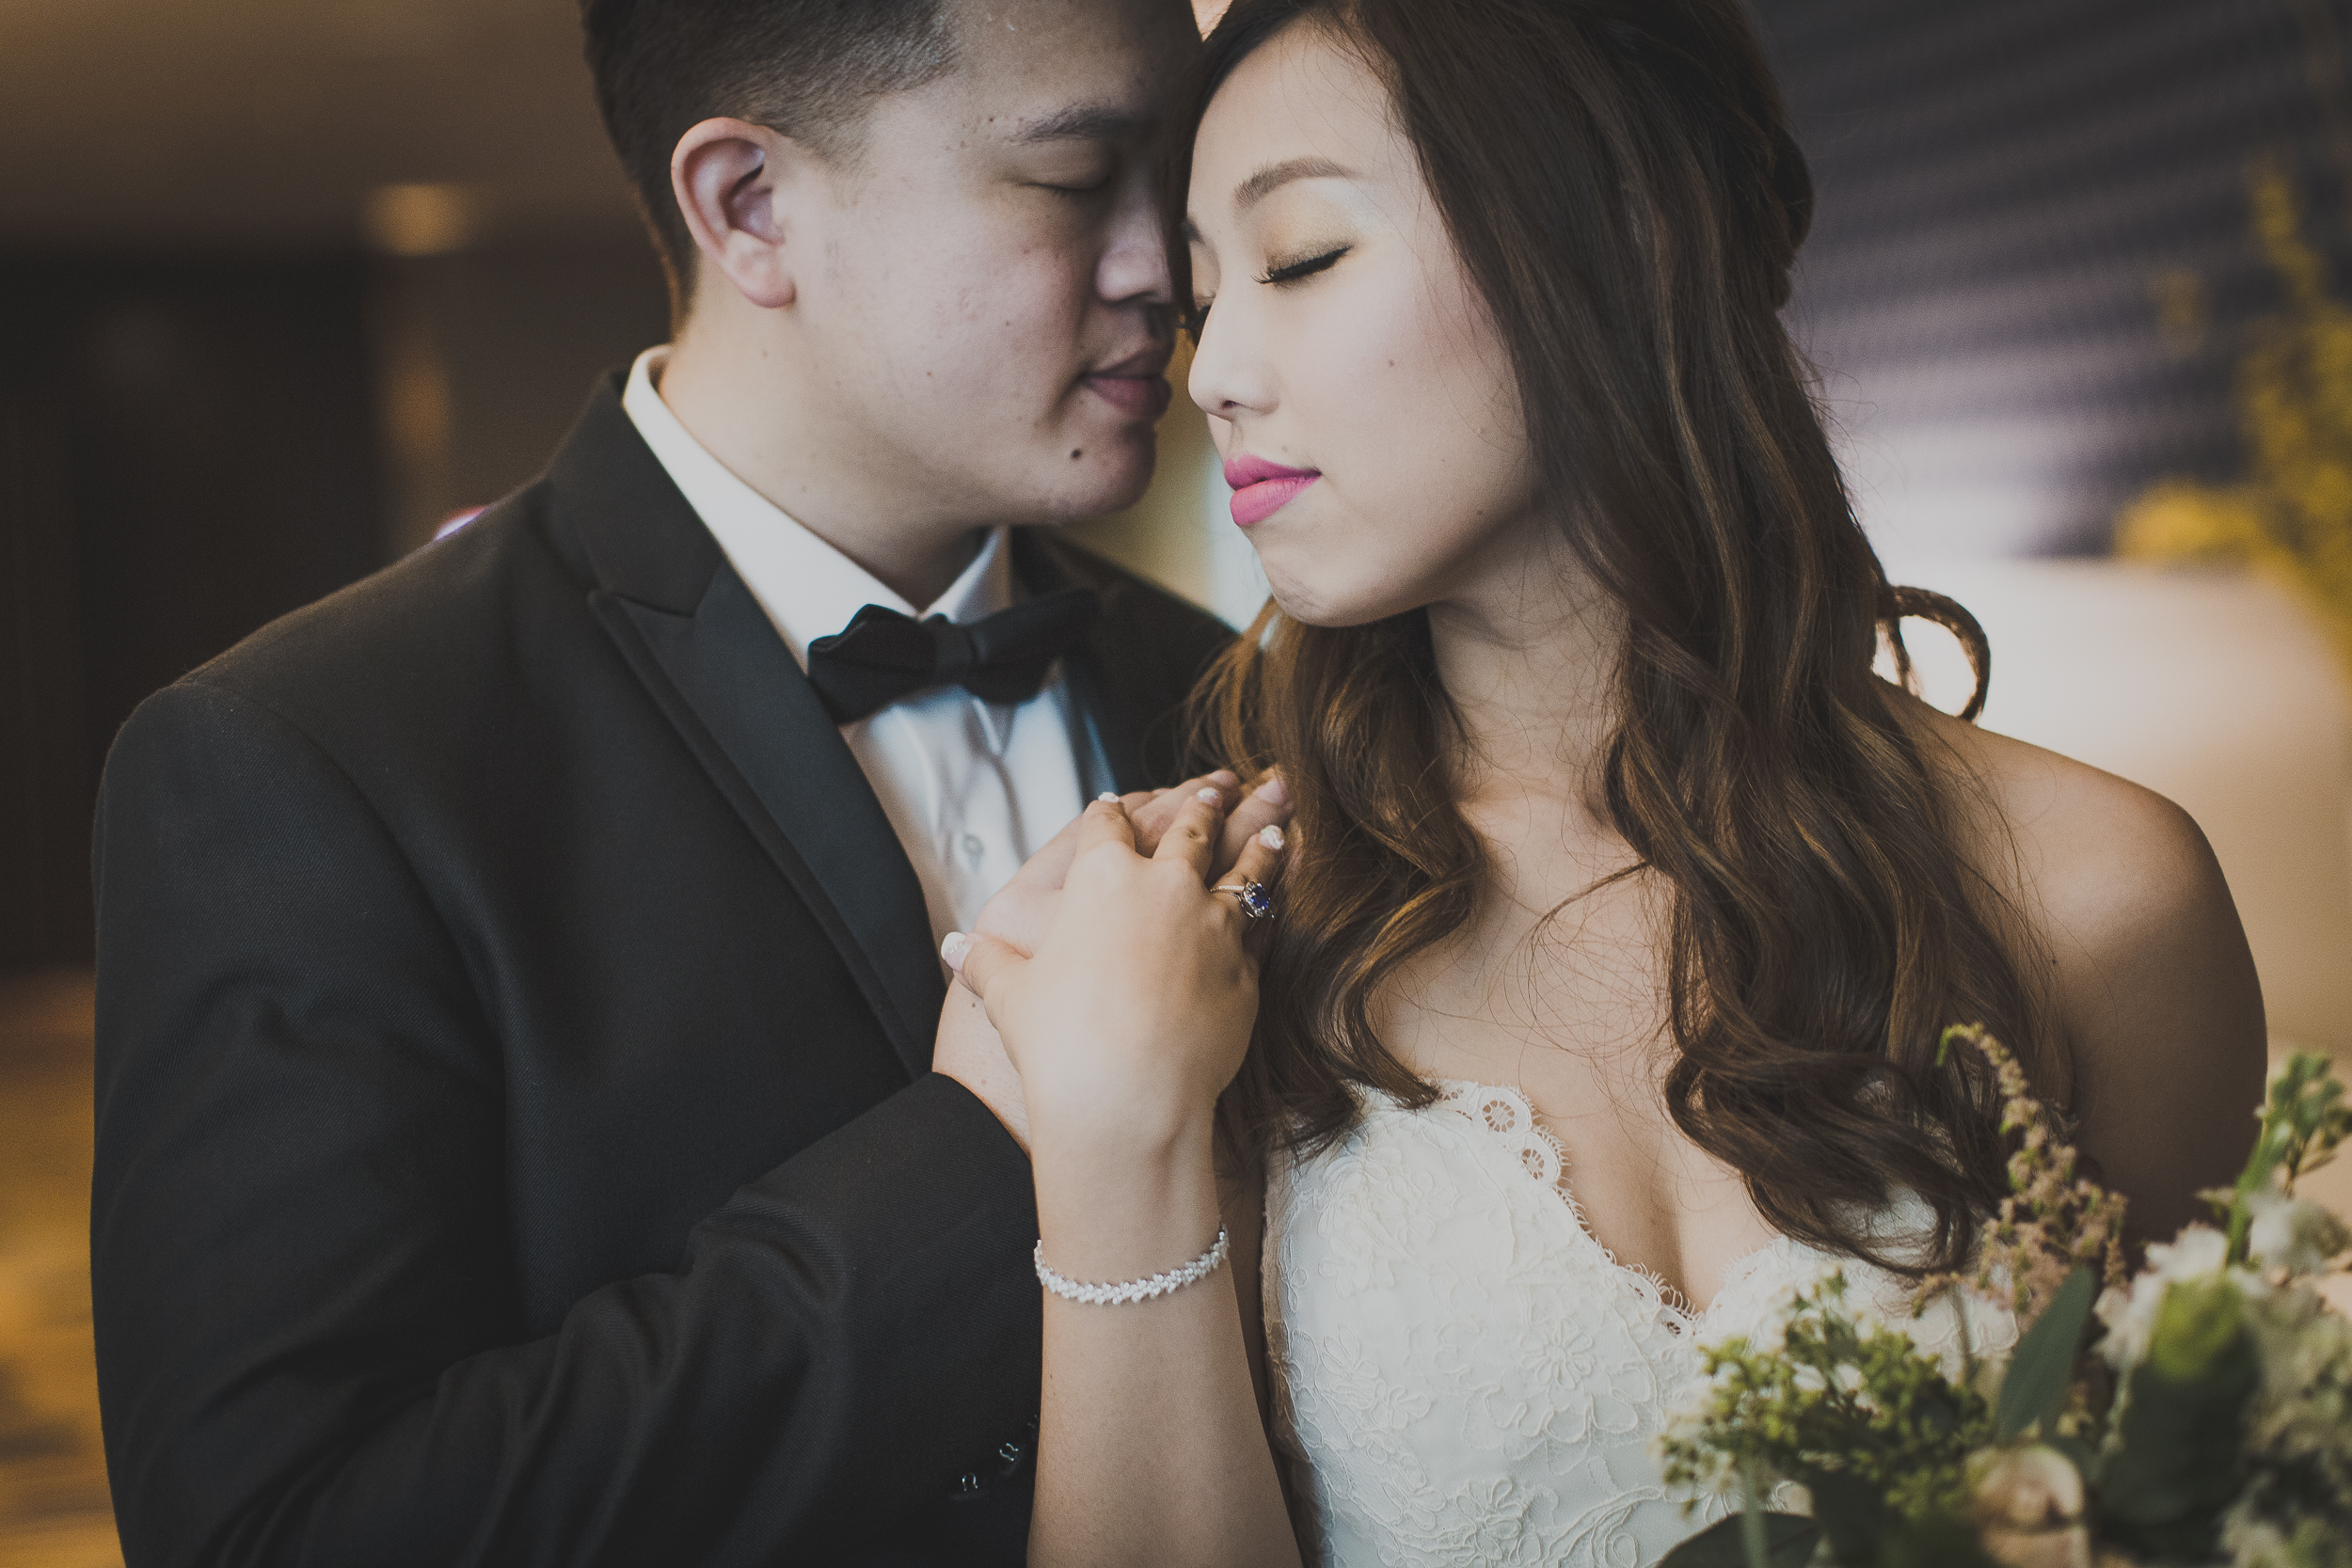 Singapore+Actual+Day+Wedding+Photographer+Grand+Mercure+Oliver+Estelle-0080.jpg